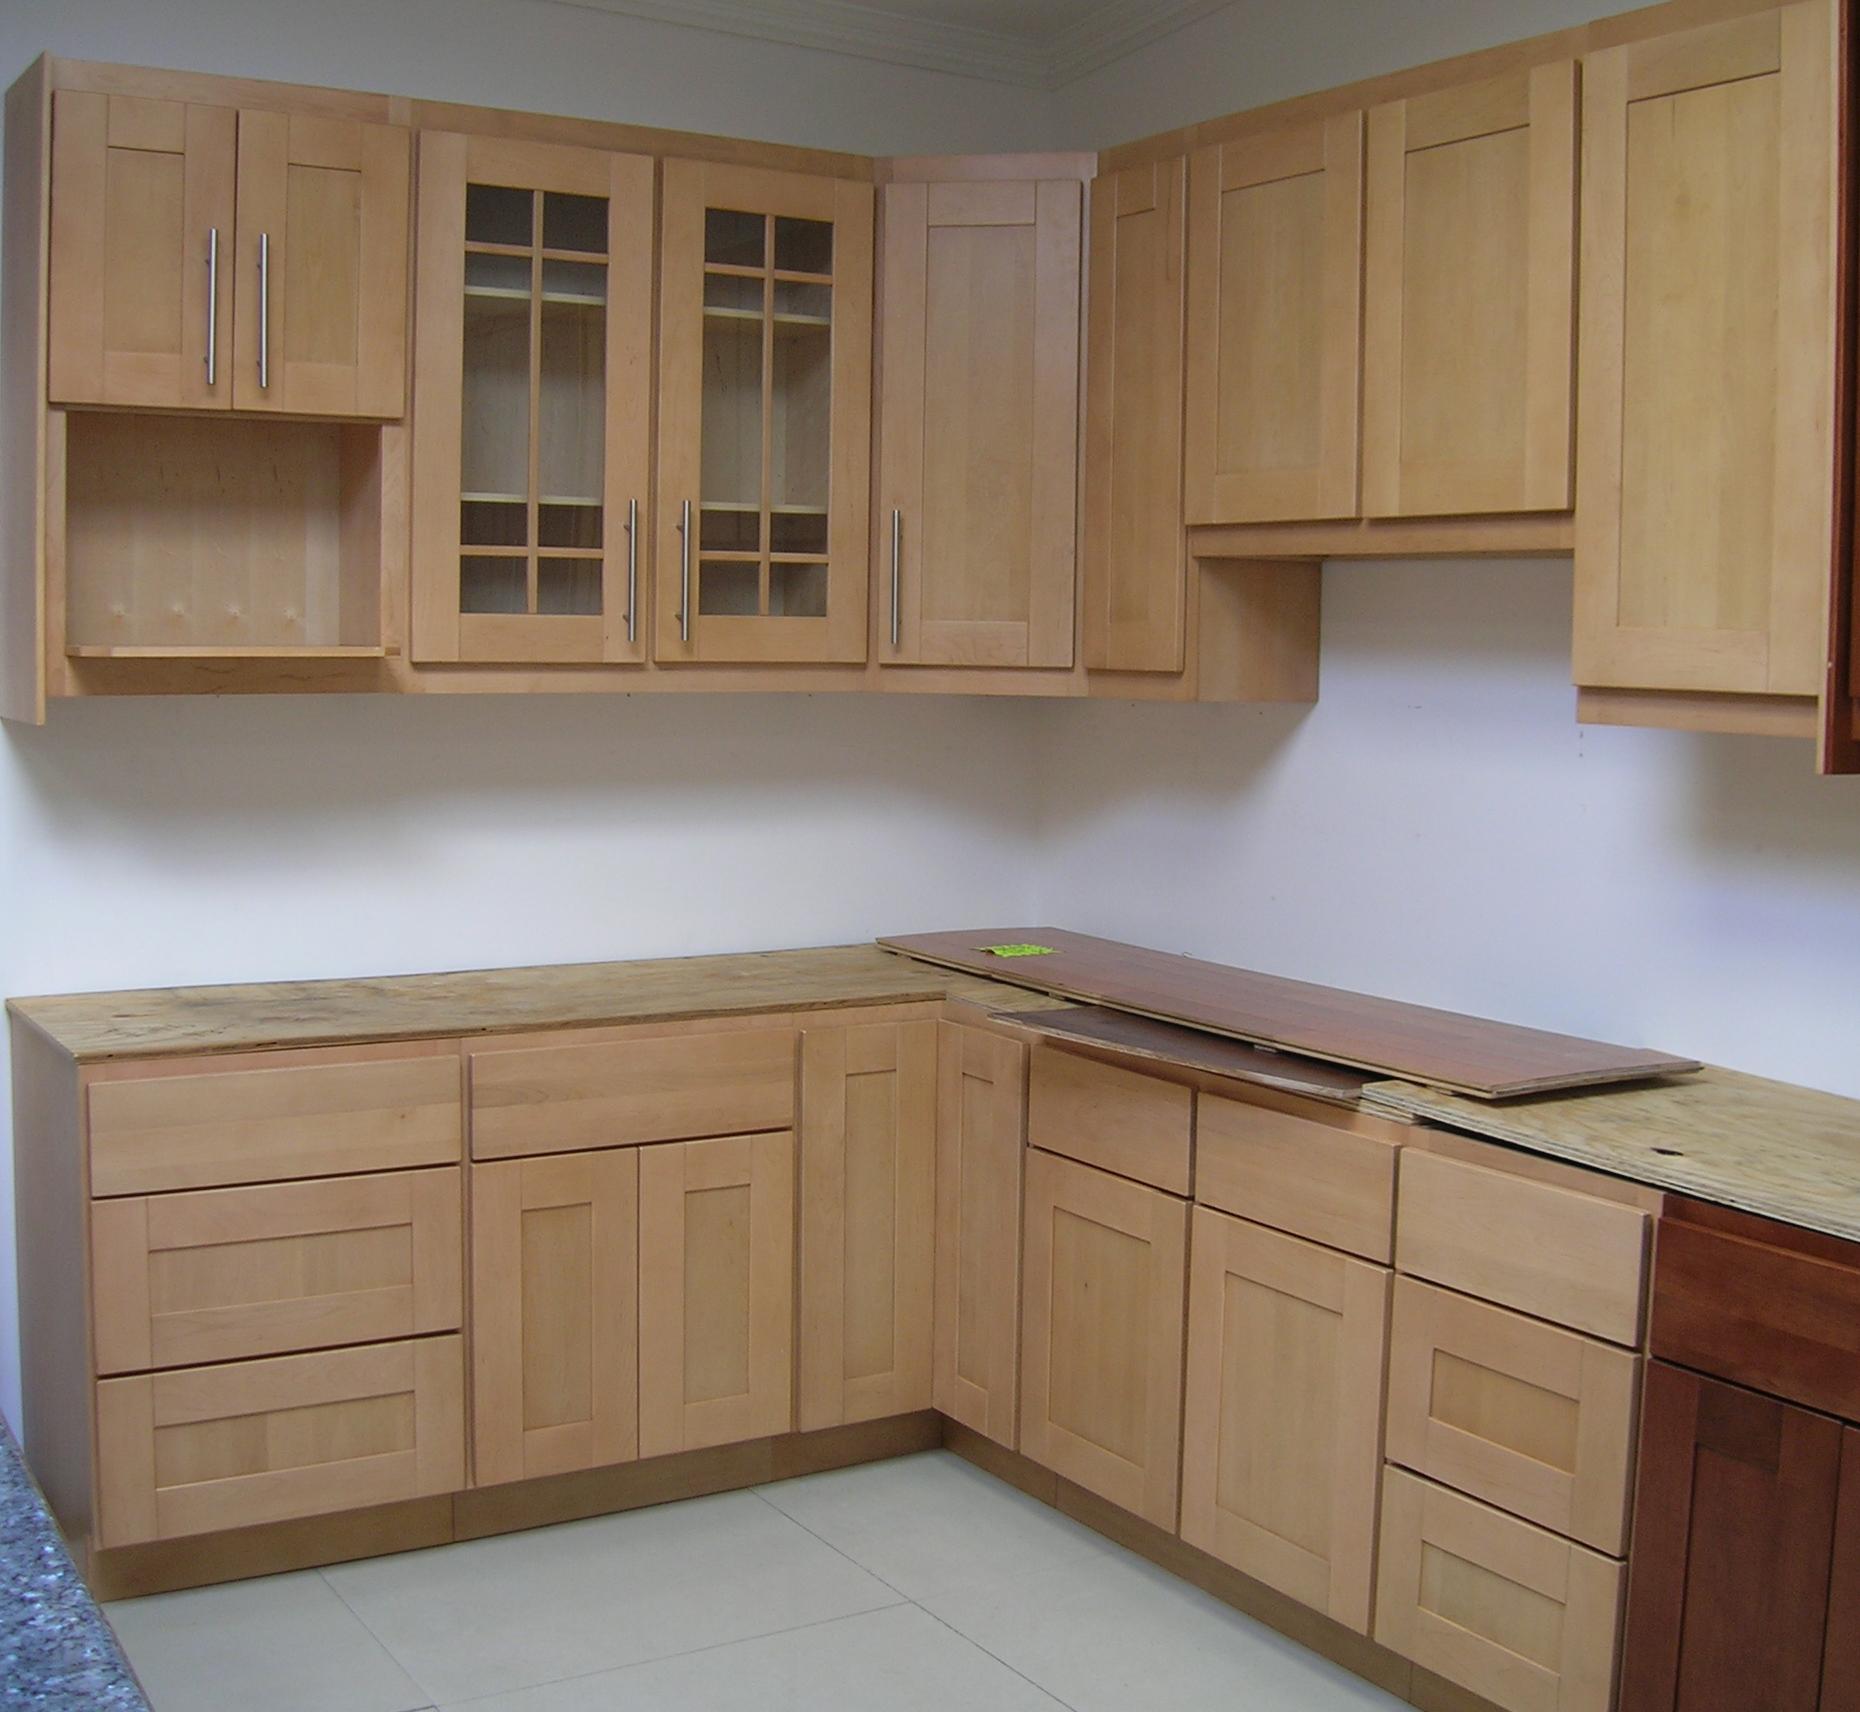 Kitchen cabinet pantry Photo - 7